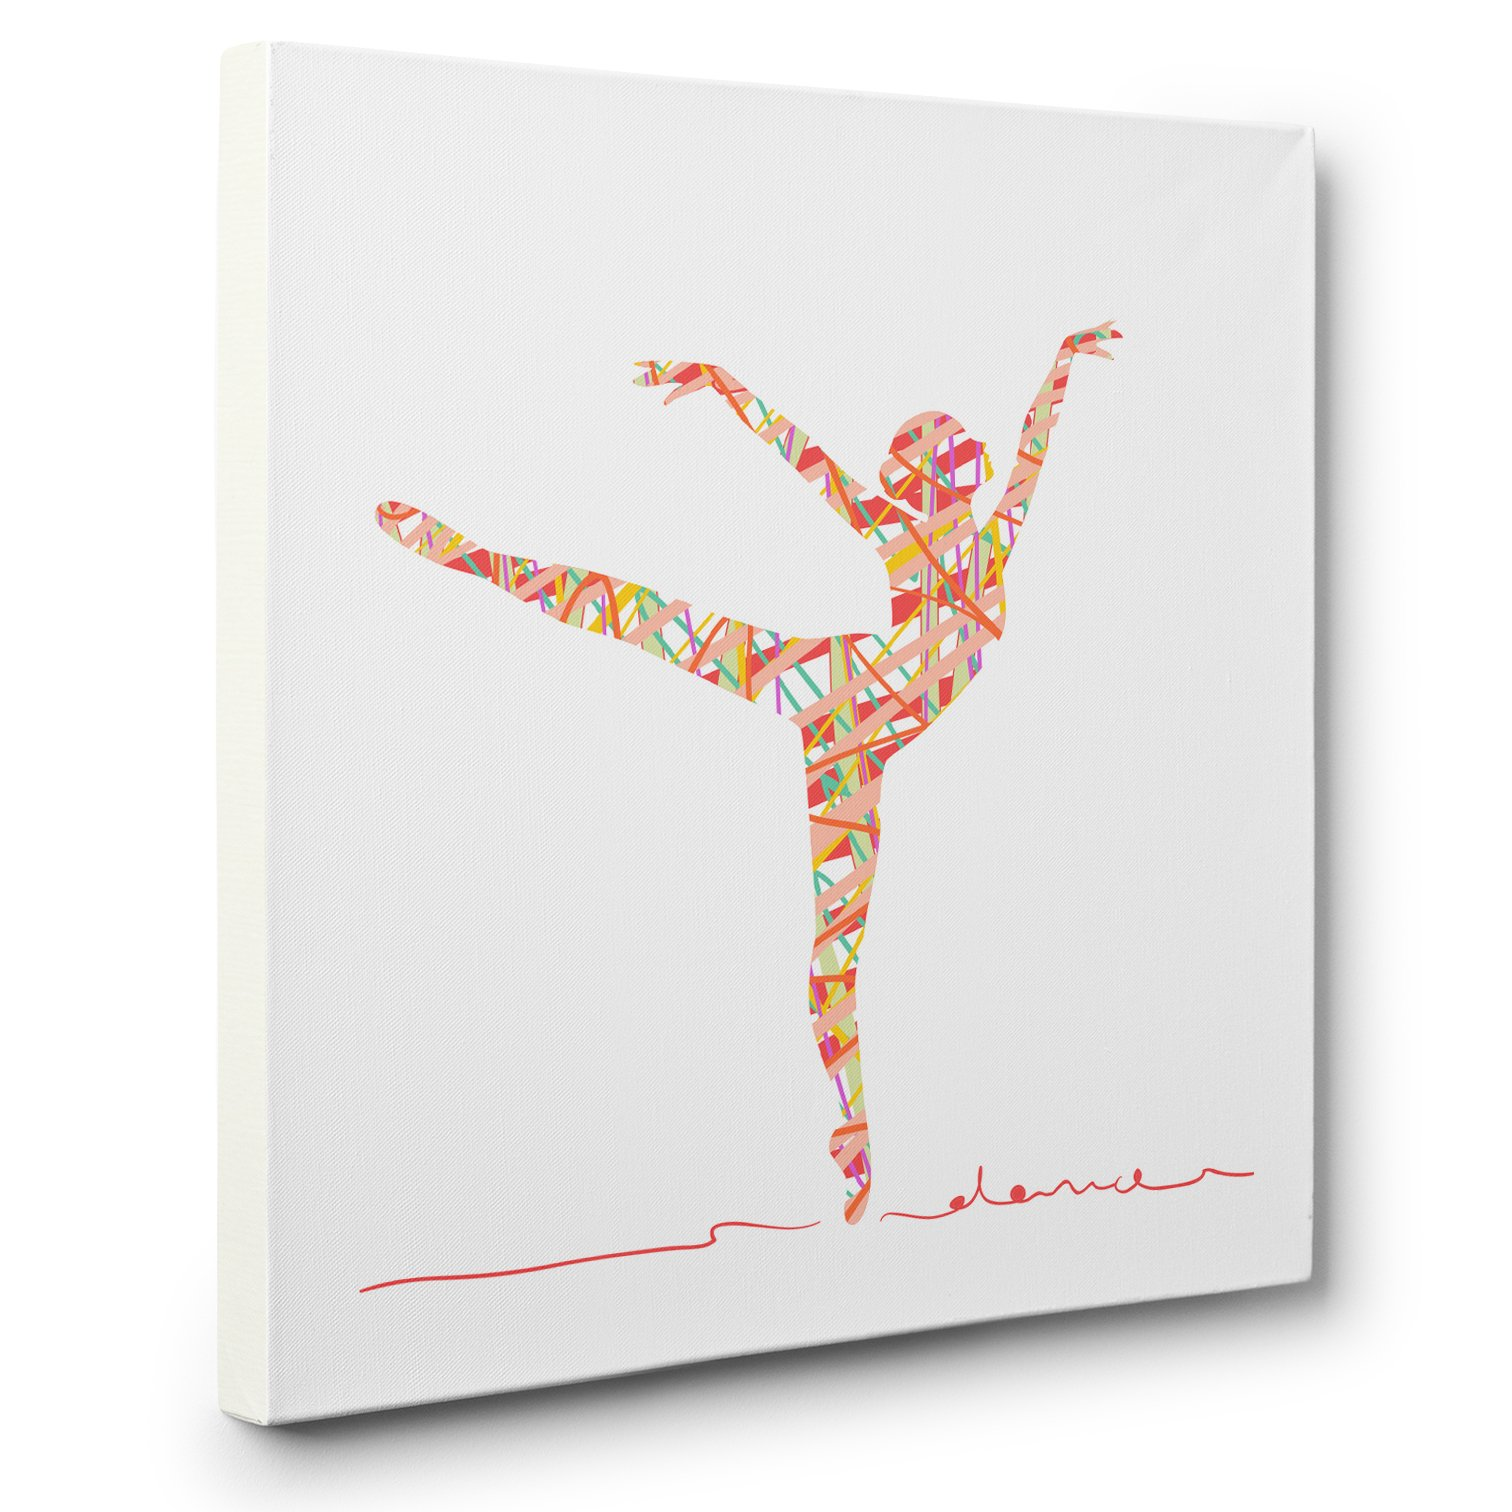 Abstract Silhouette Dancer CANVAS Wall Art Home Décor